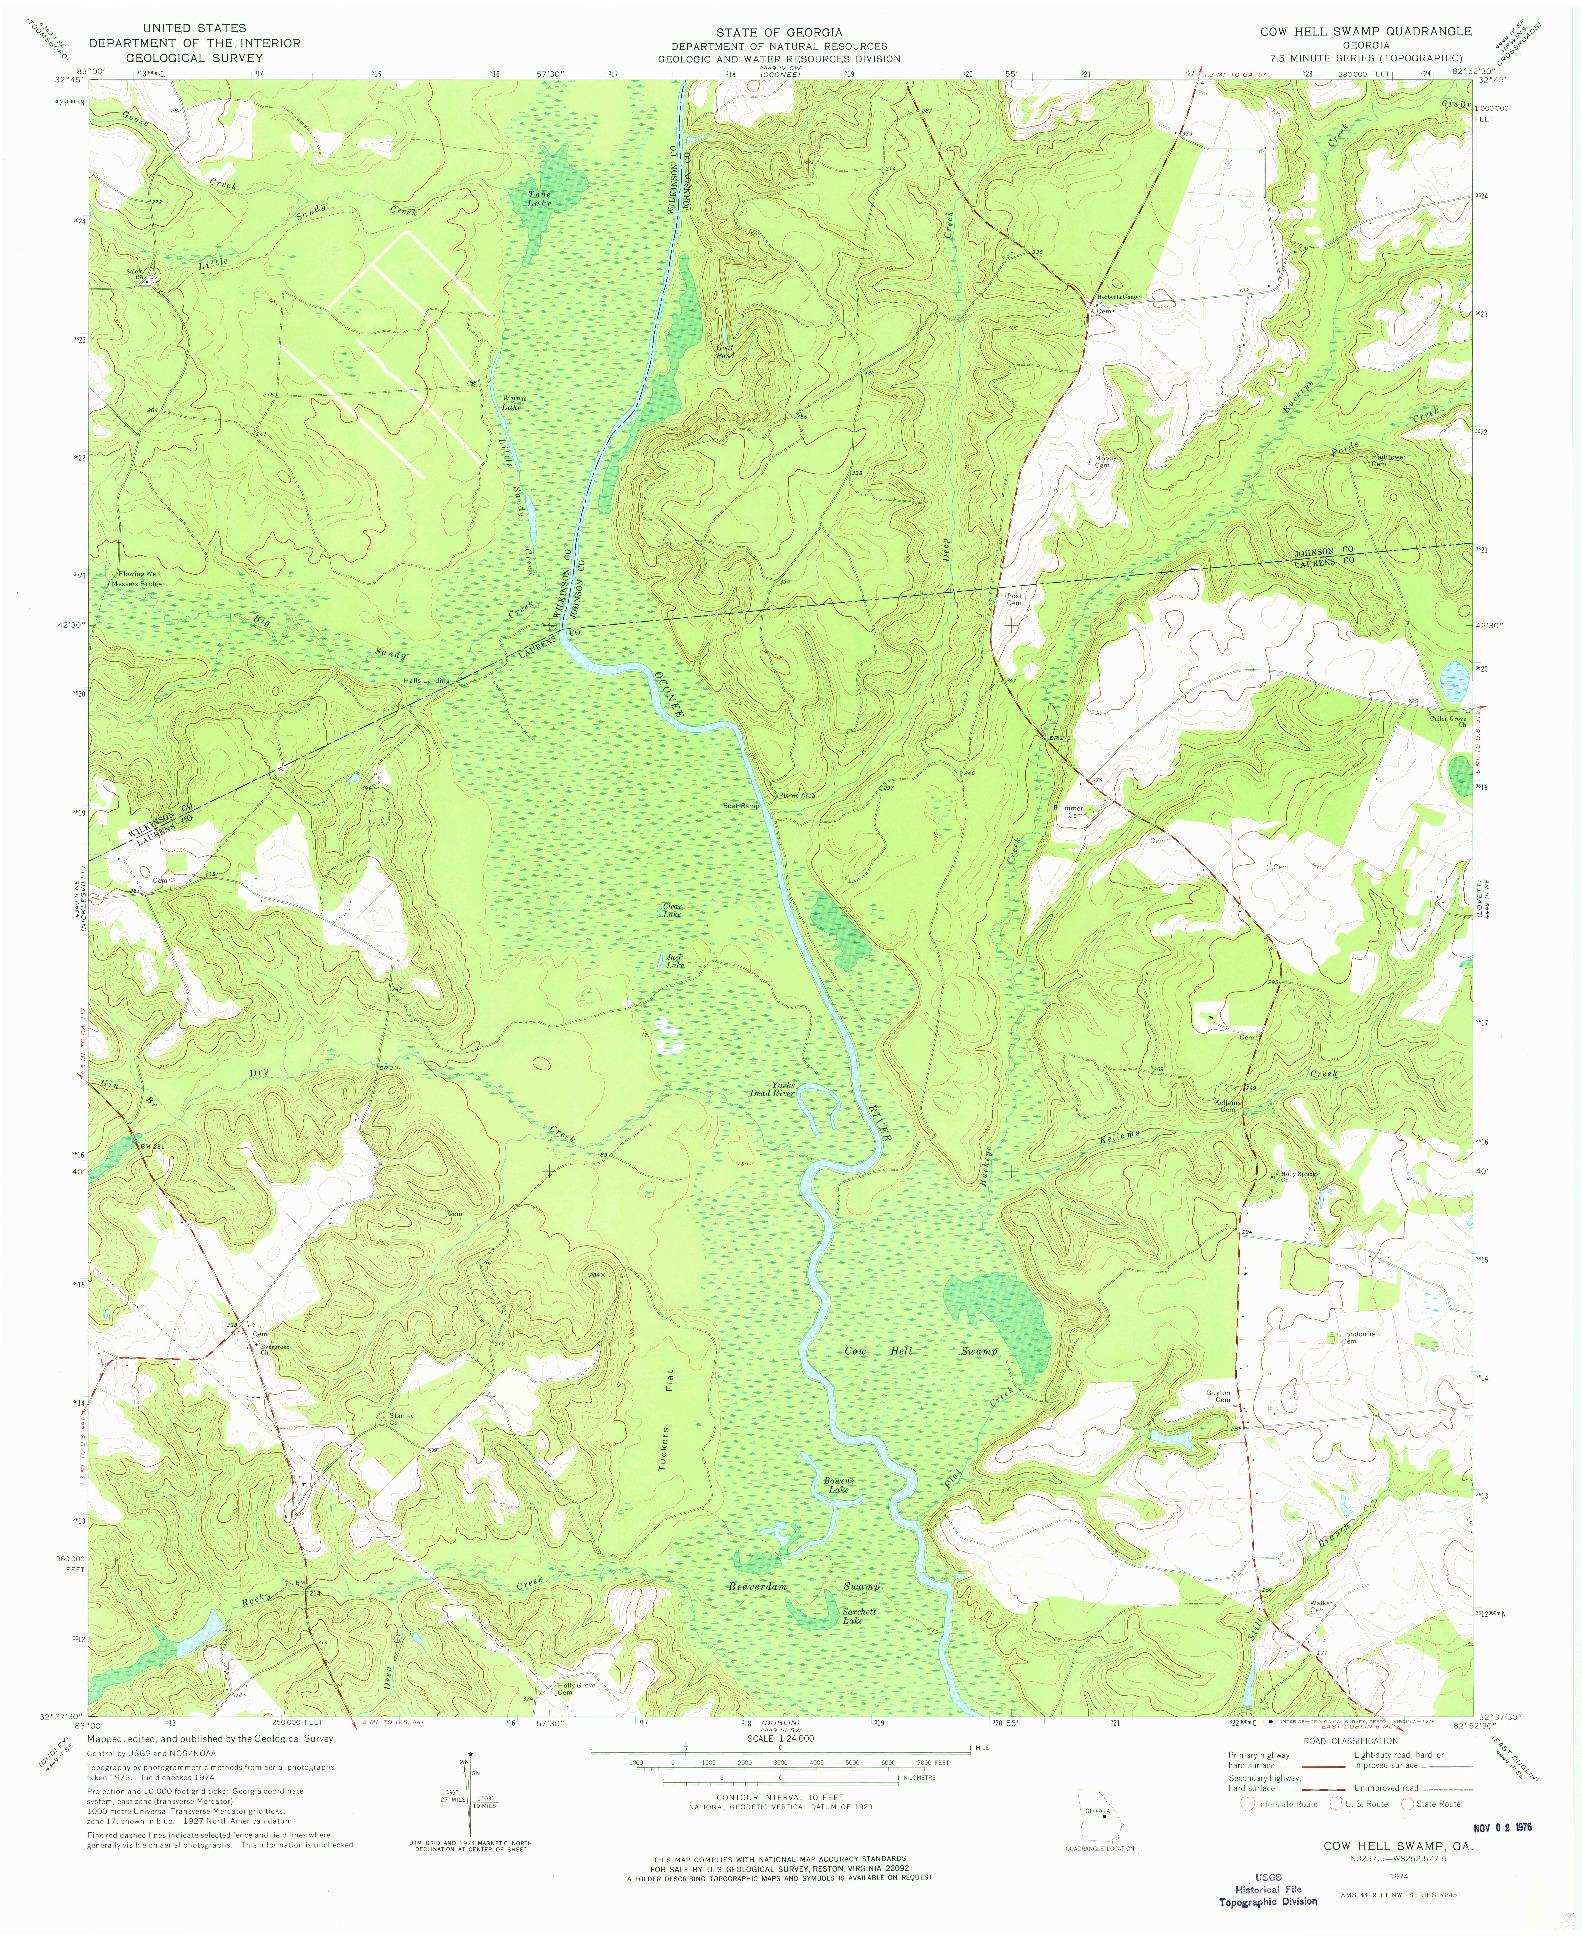 USGS 1:24000-SCALE QUADRANGLE FOR COW HELL SWAMP, GA 1974